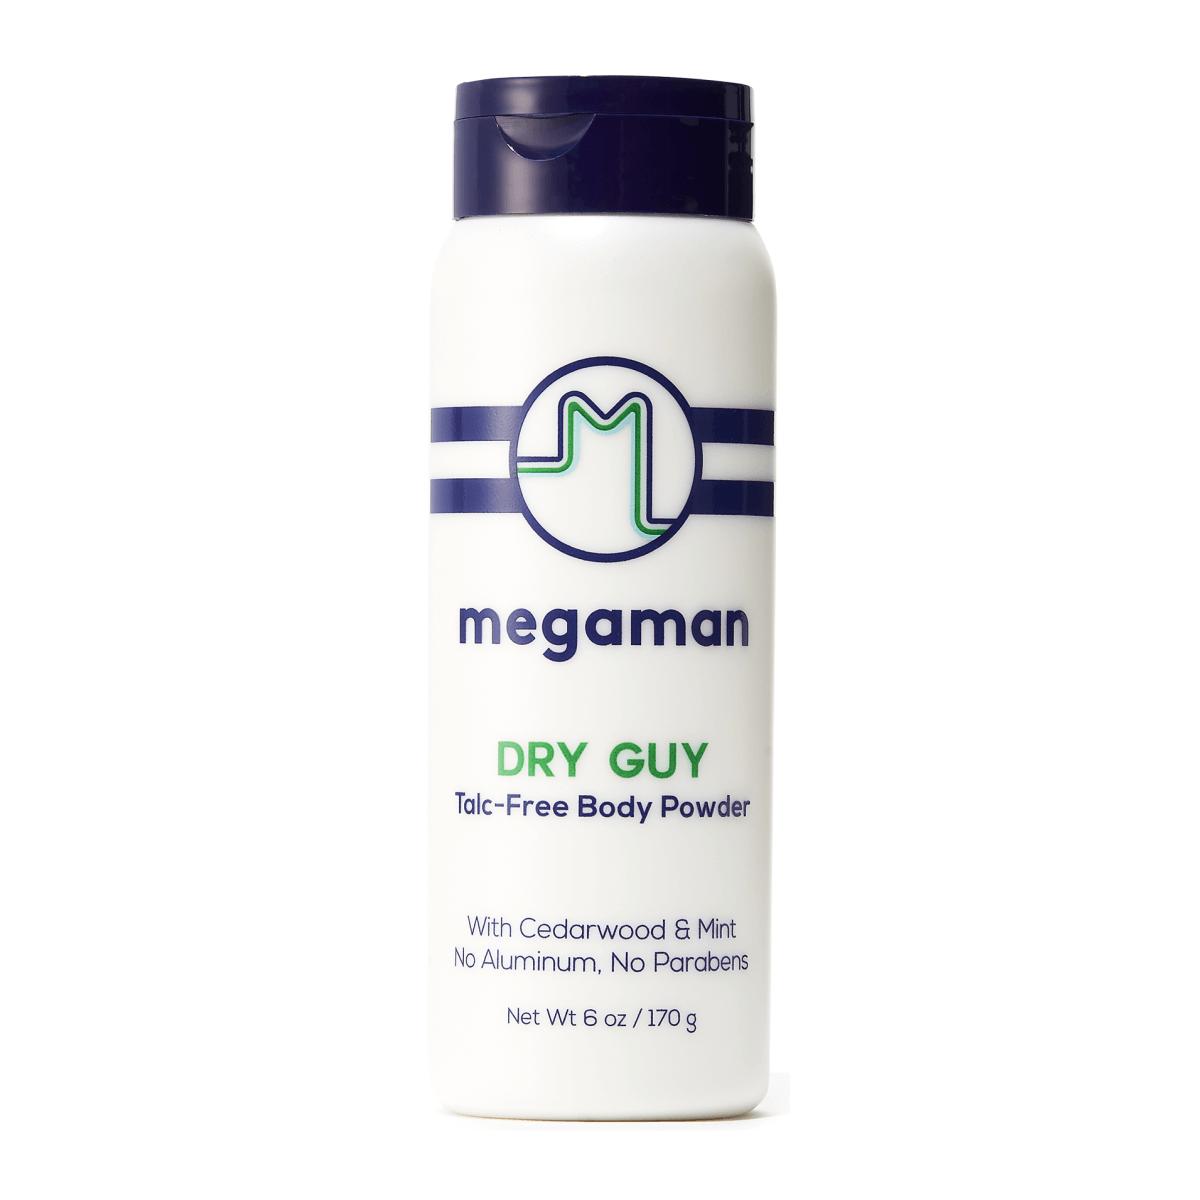 Megababe Megaman Dry Guy